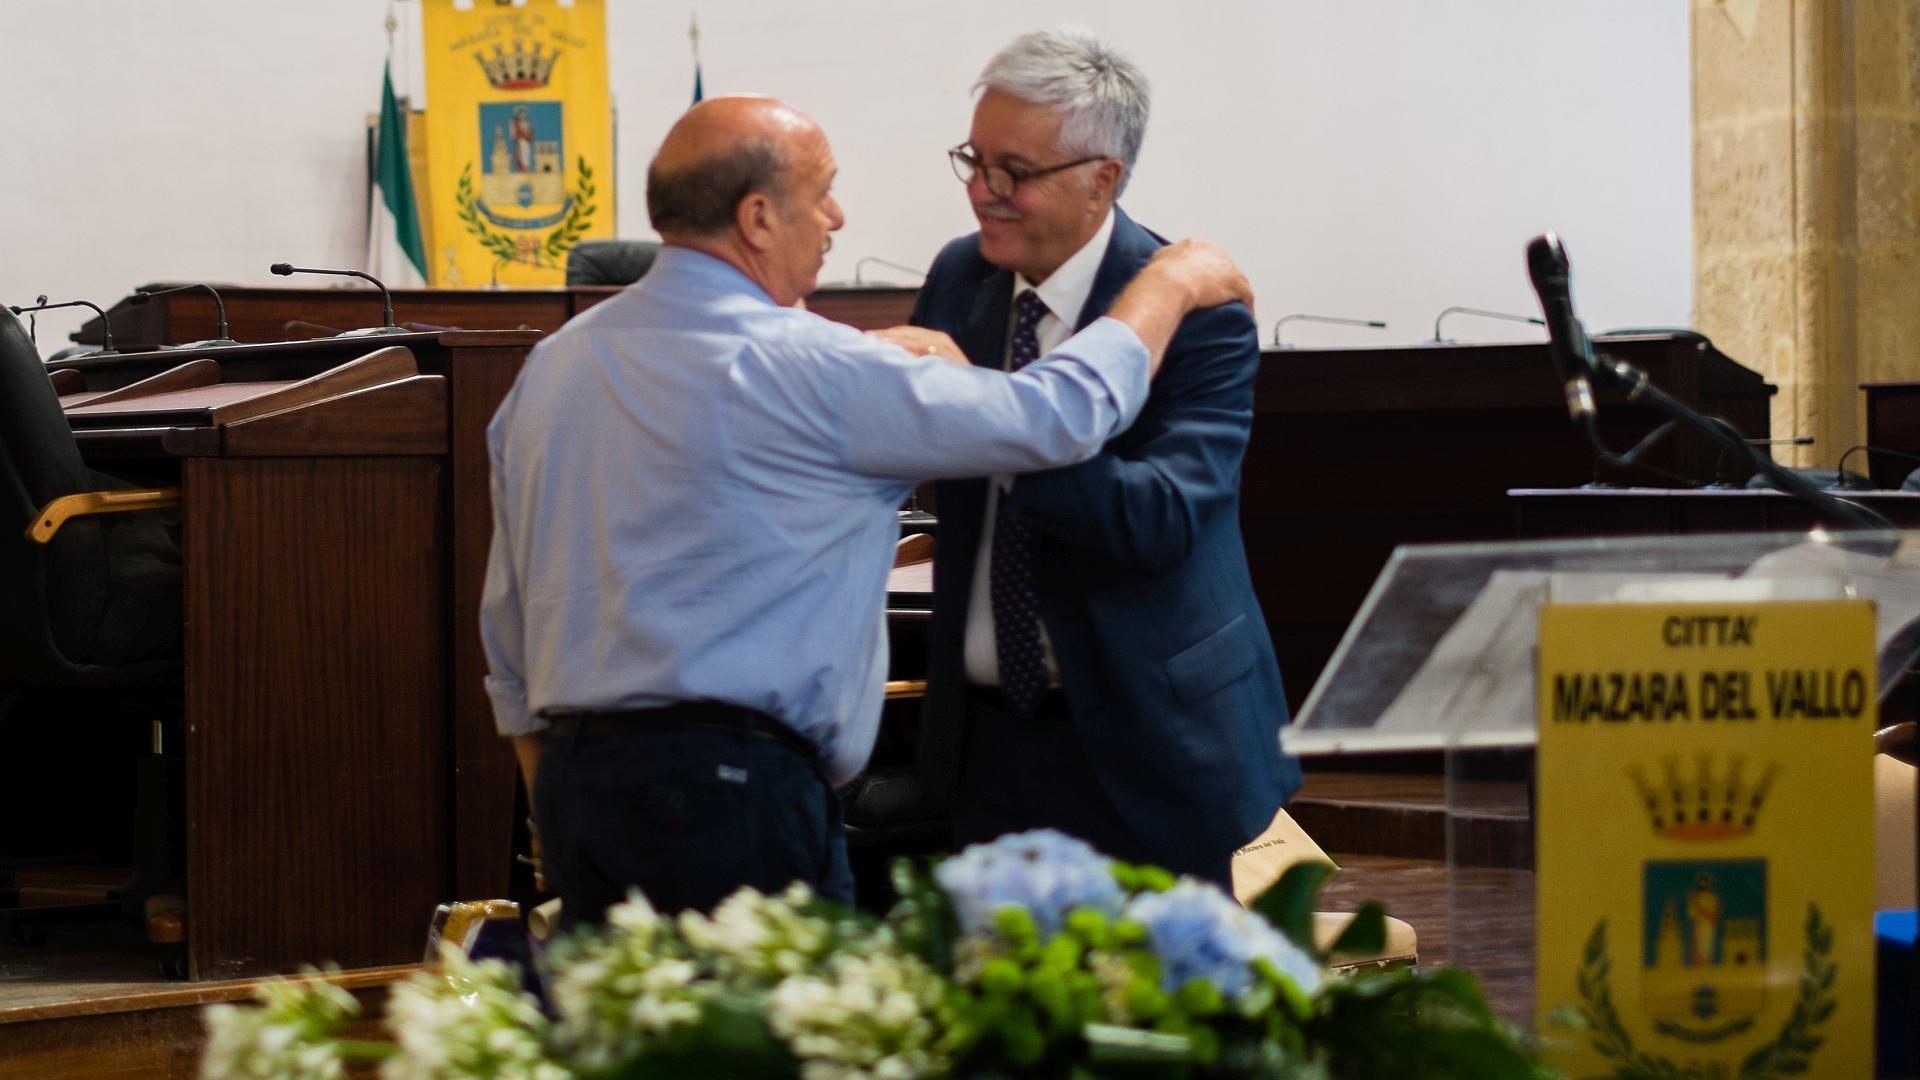 Filippo Mirasolo e Giovanni Bavetta